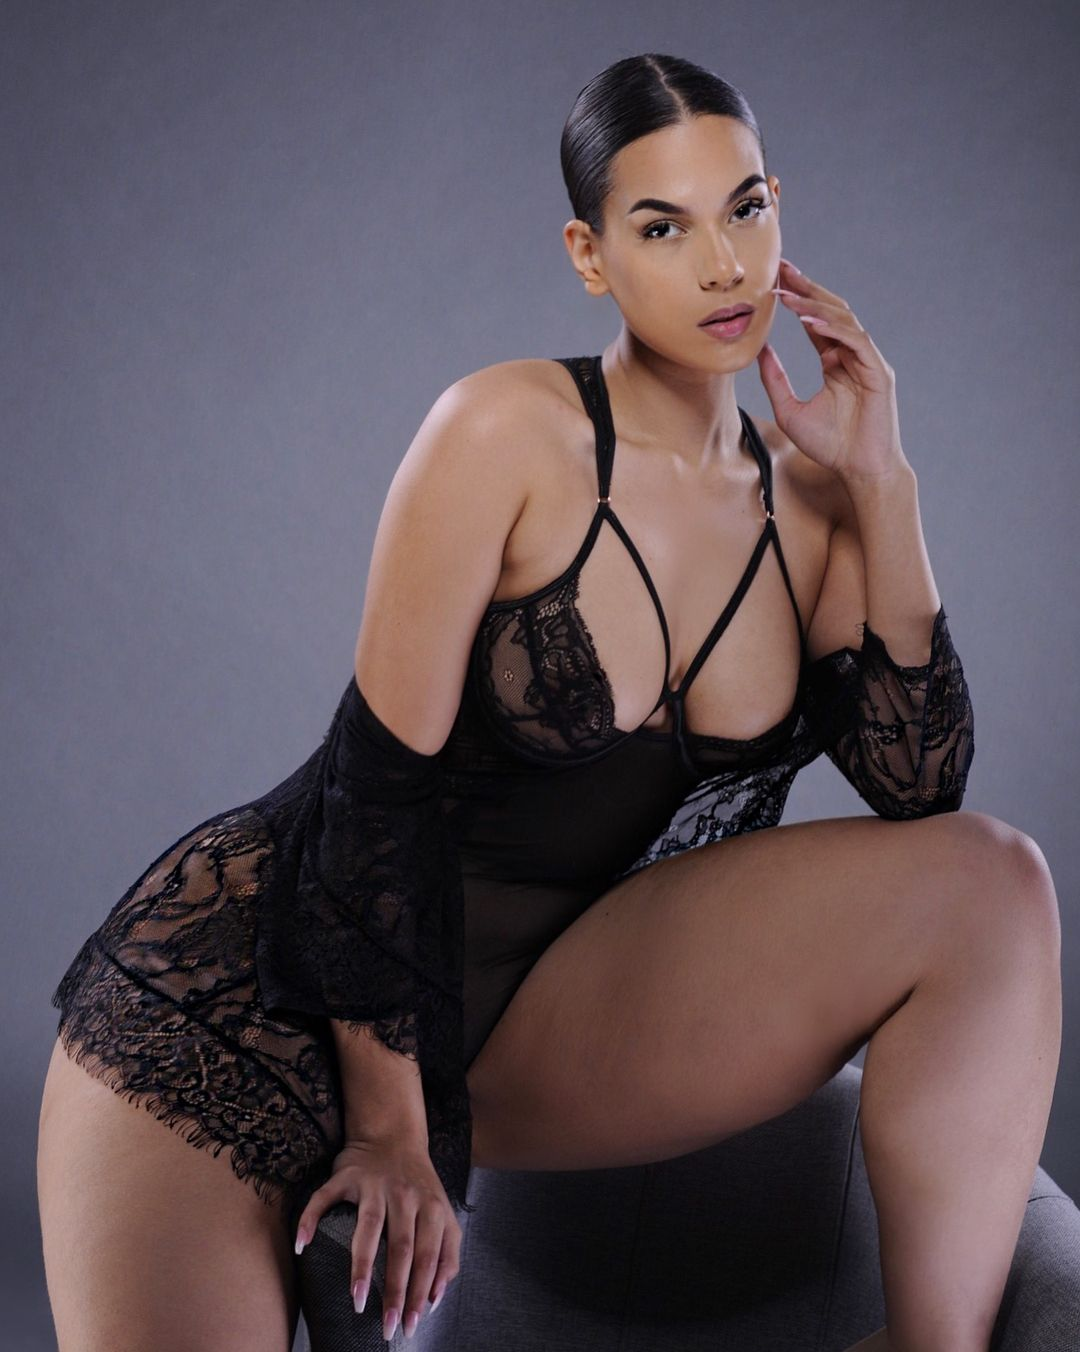 Cake Queen Amirahdyme Amirah D In 2018 Pinterest Dress Mini Sexy Lingerie Babydoll Gaun Malam Wanita Beautiful Black Women Dresses Nice